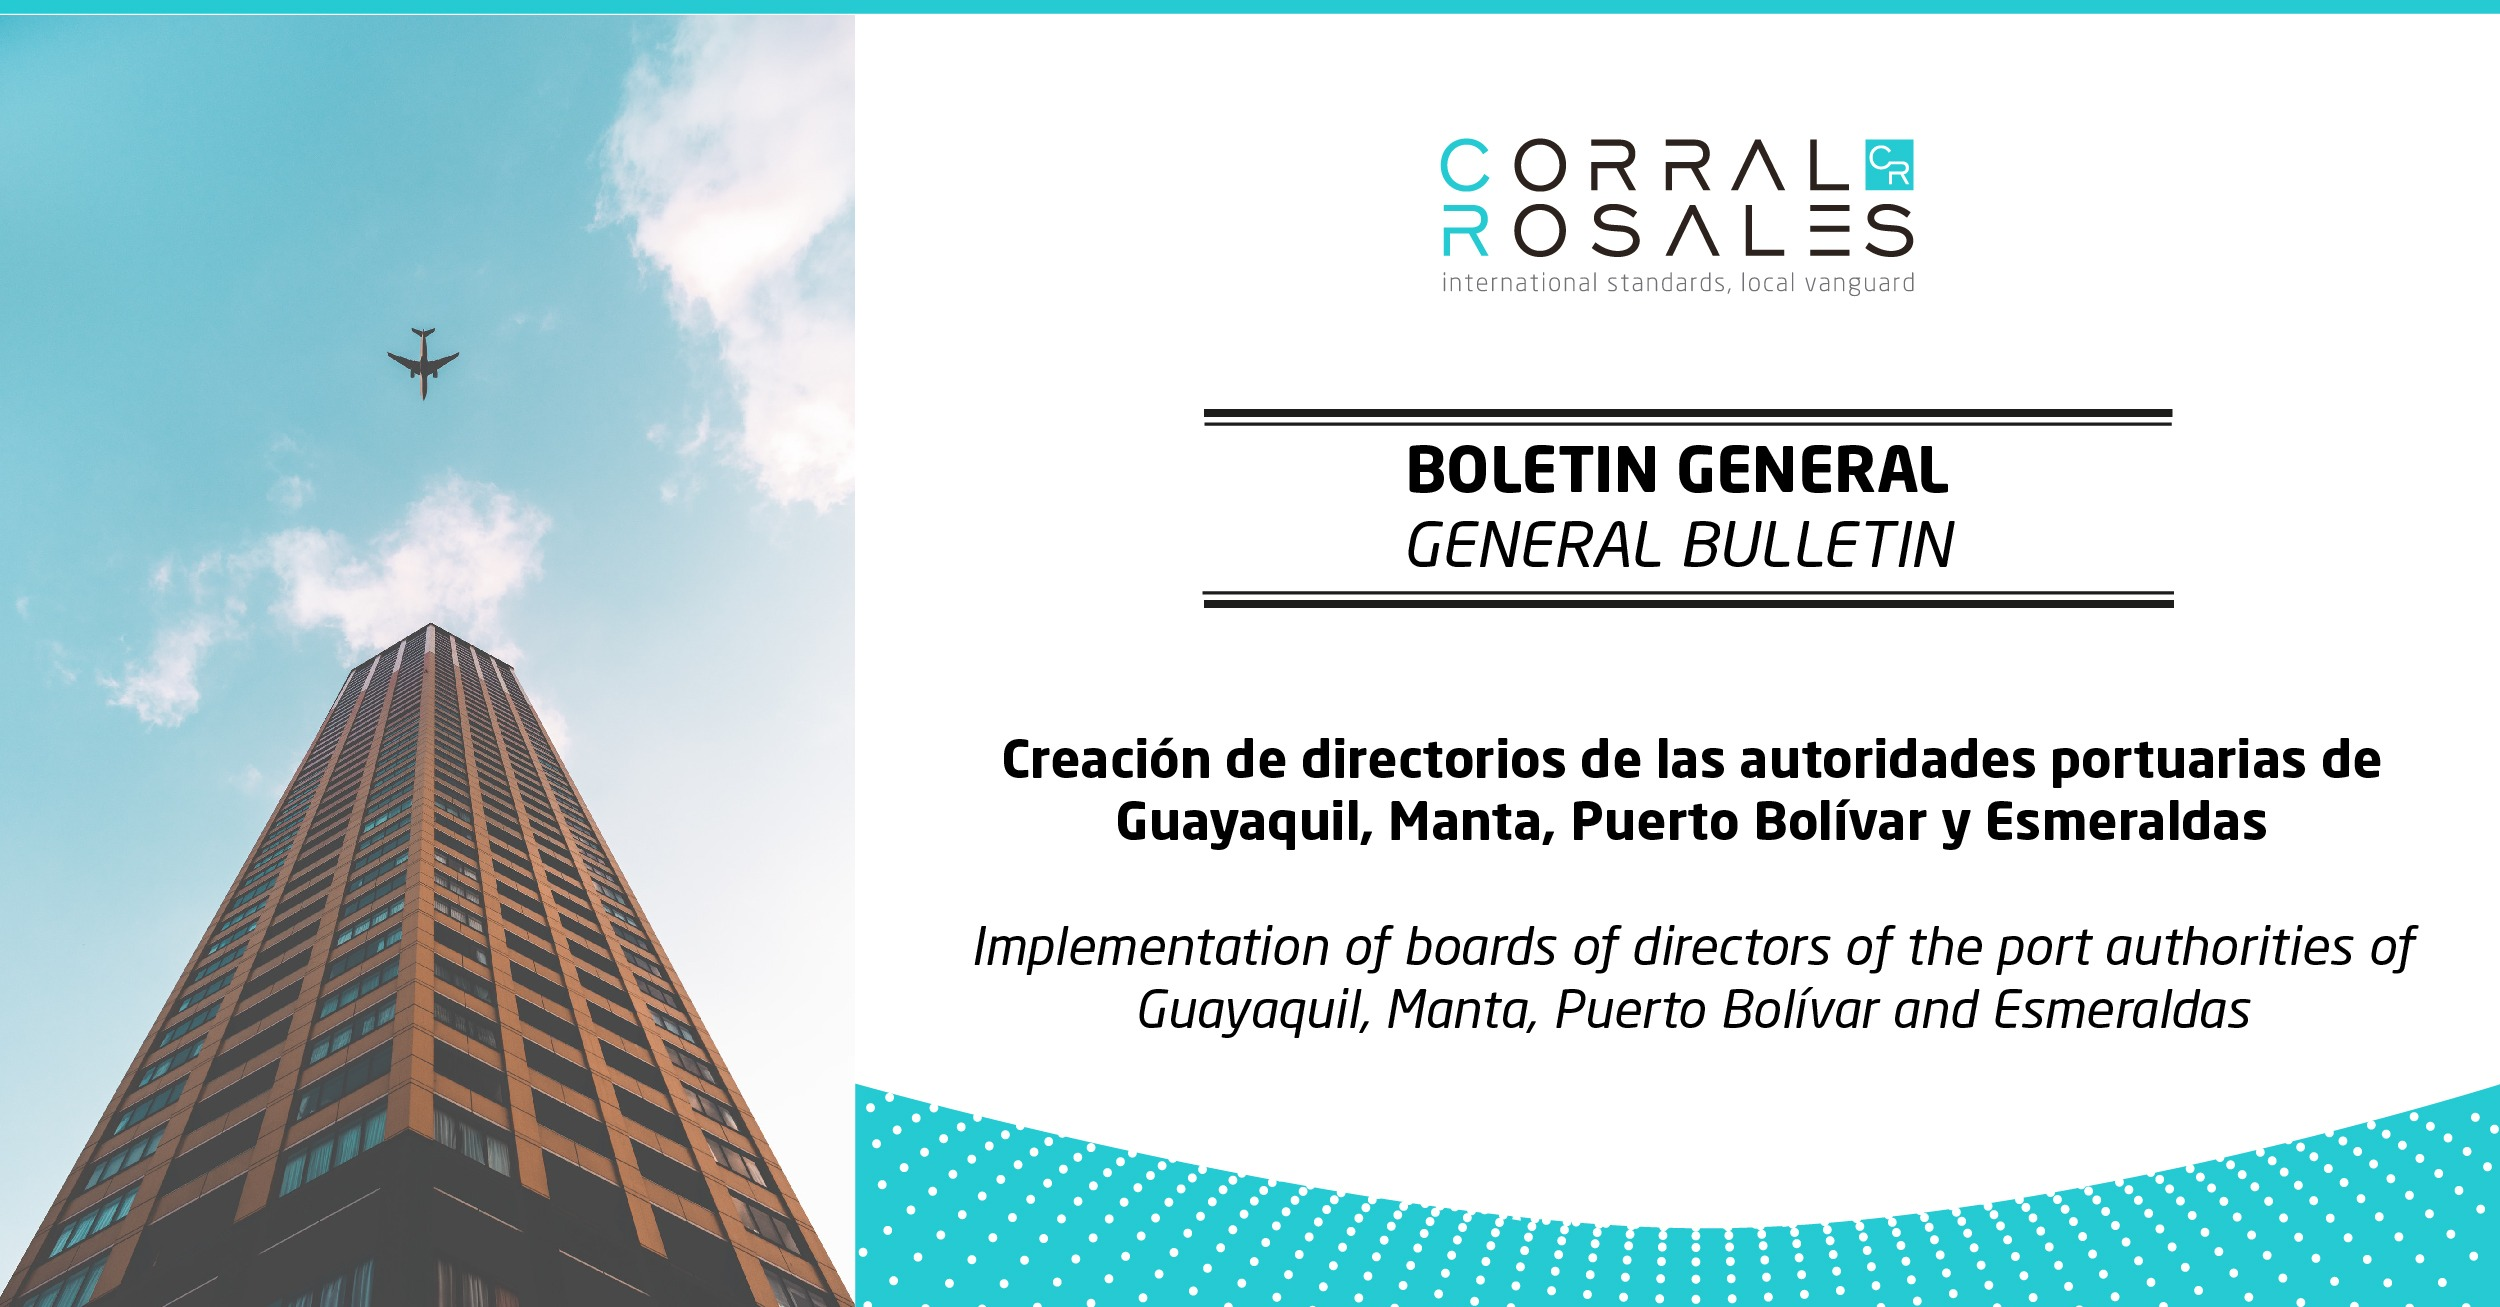 Implementation of boards of directors of the port authorities of Guayaquil, Manta, Puerto Bolívar and Esmeraldas - CorralRosales - Lawyers Ecuador